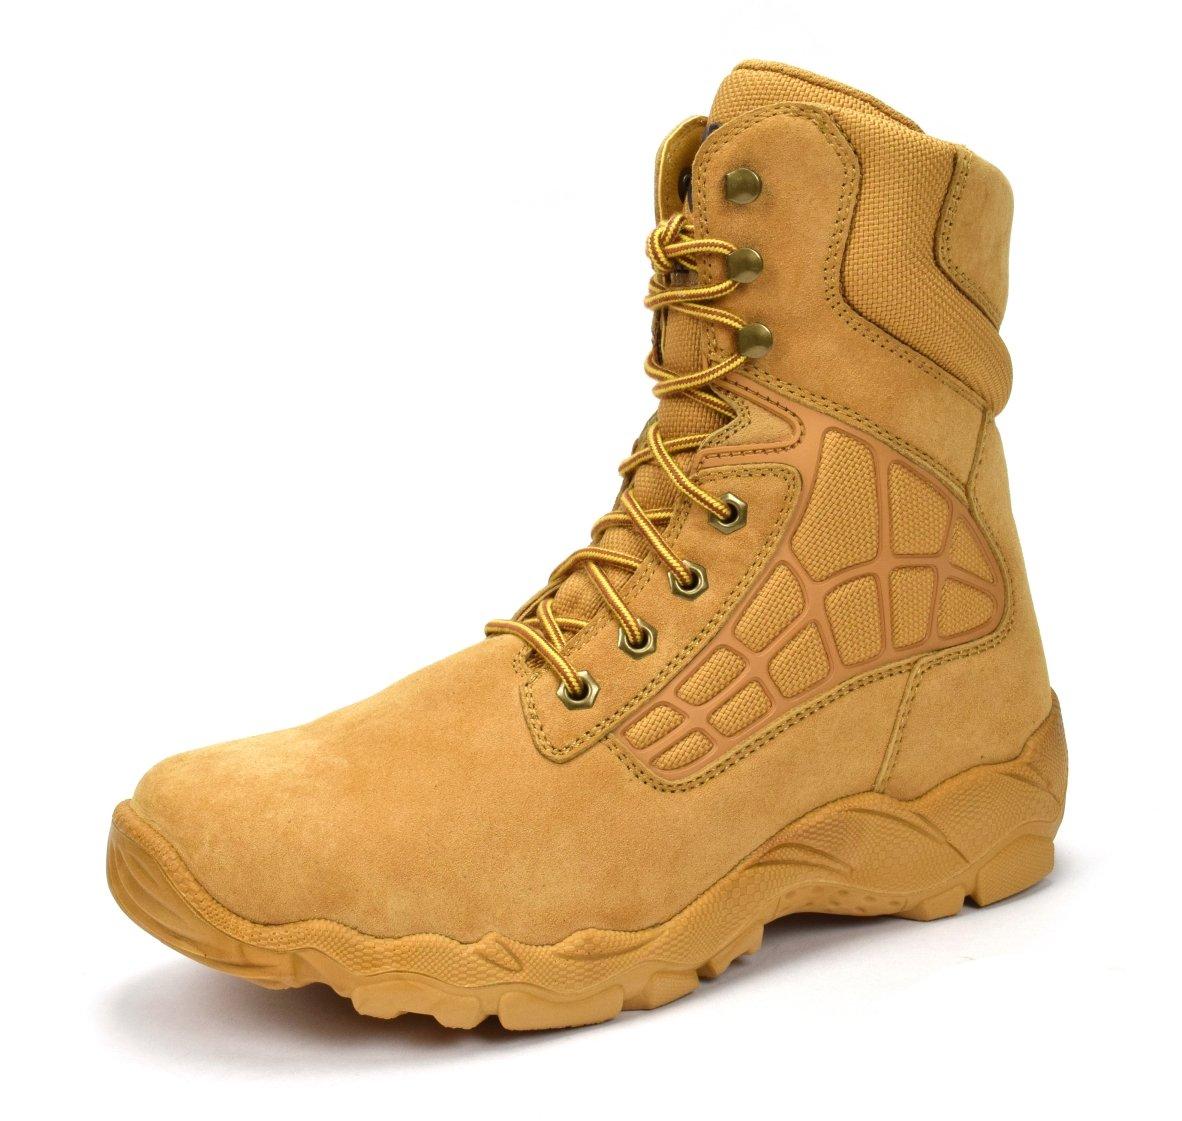 CONDOR Arizona Men's 8'' Steel Toe Work Boot - Wheat, Size 12 E US